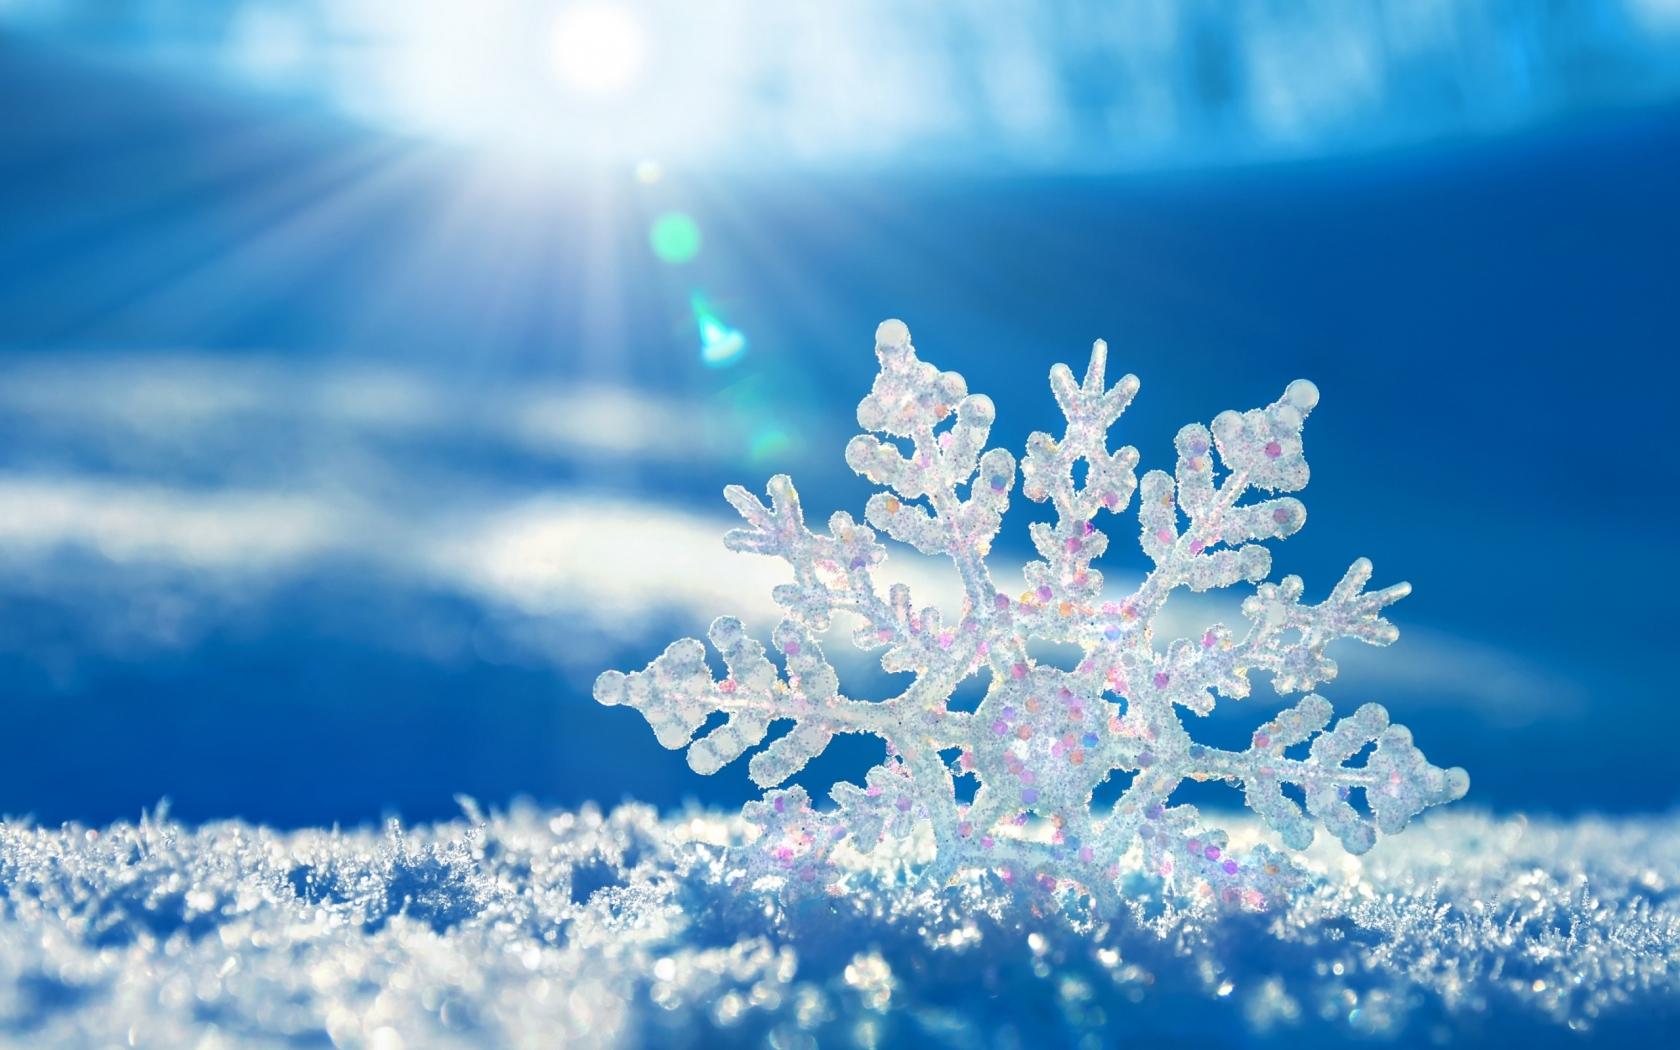 Cristal de hielo - 1680x1050